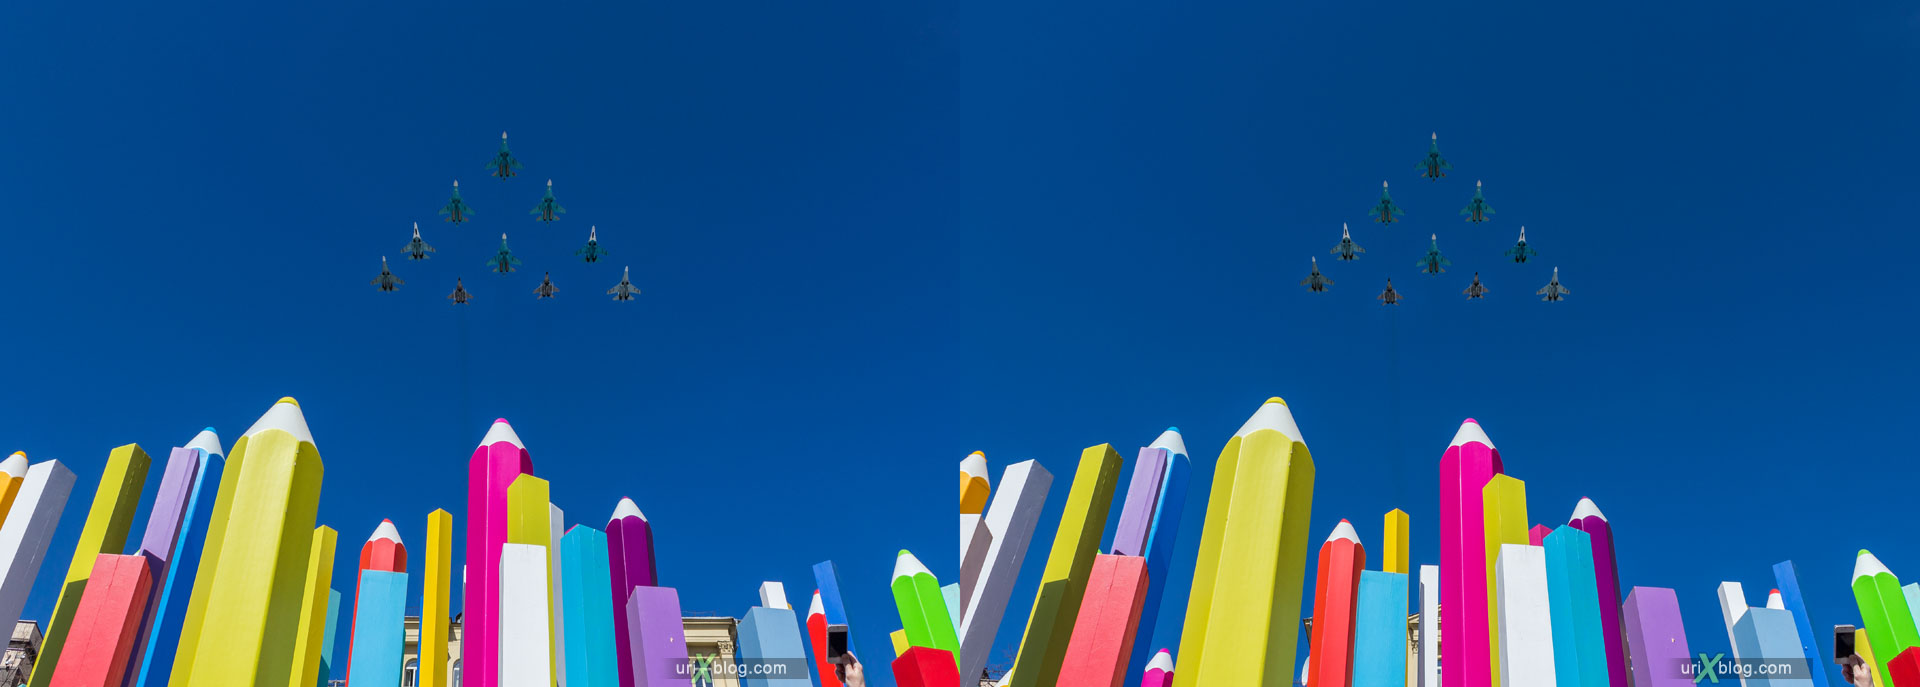 парад, самолёты, авиапарад, репетиция, пролёт, Пушкинская площадь, карандаши, Москва, Россия, 3D, перекрёстная стереопара, стерео, стереопара, 2015